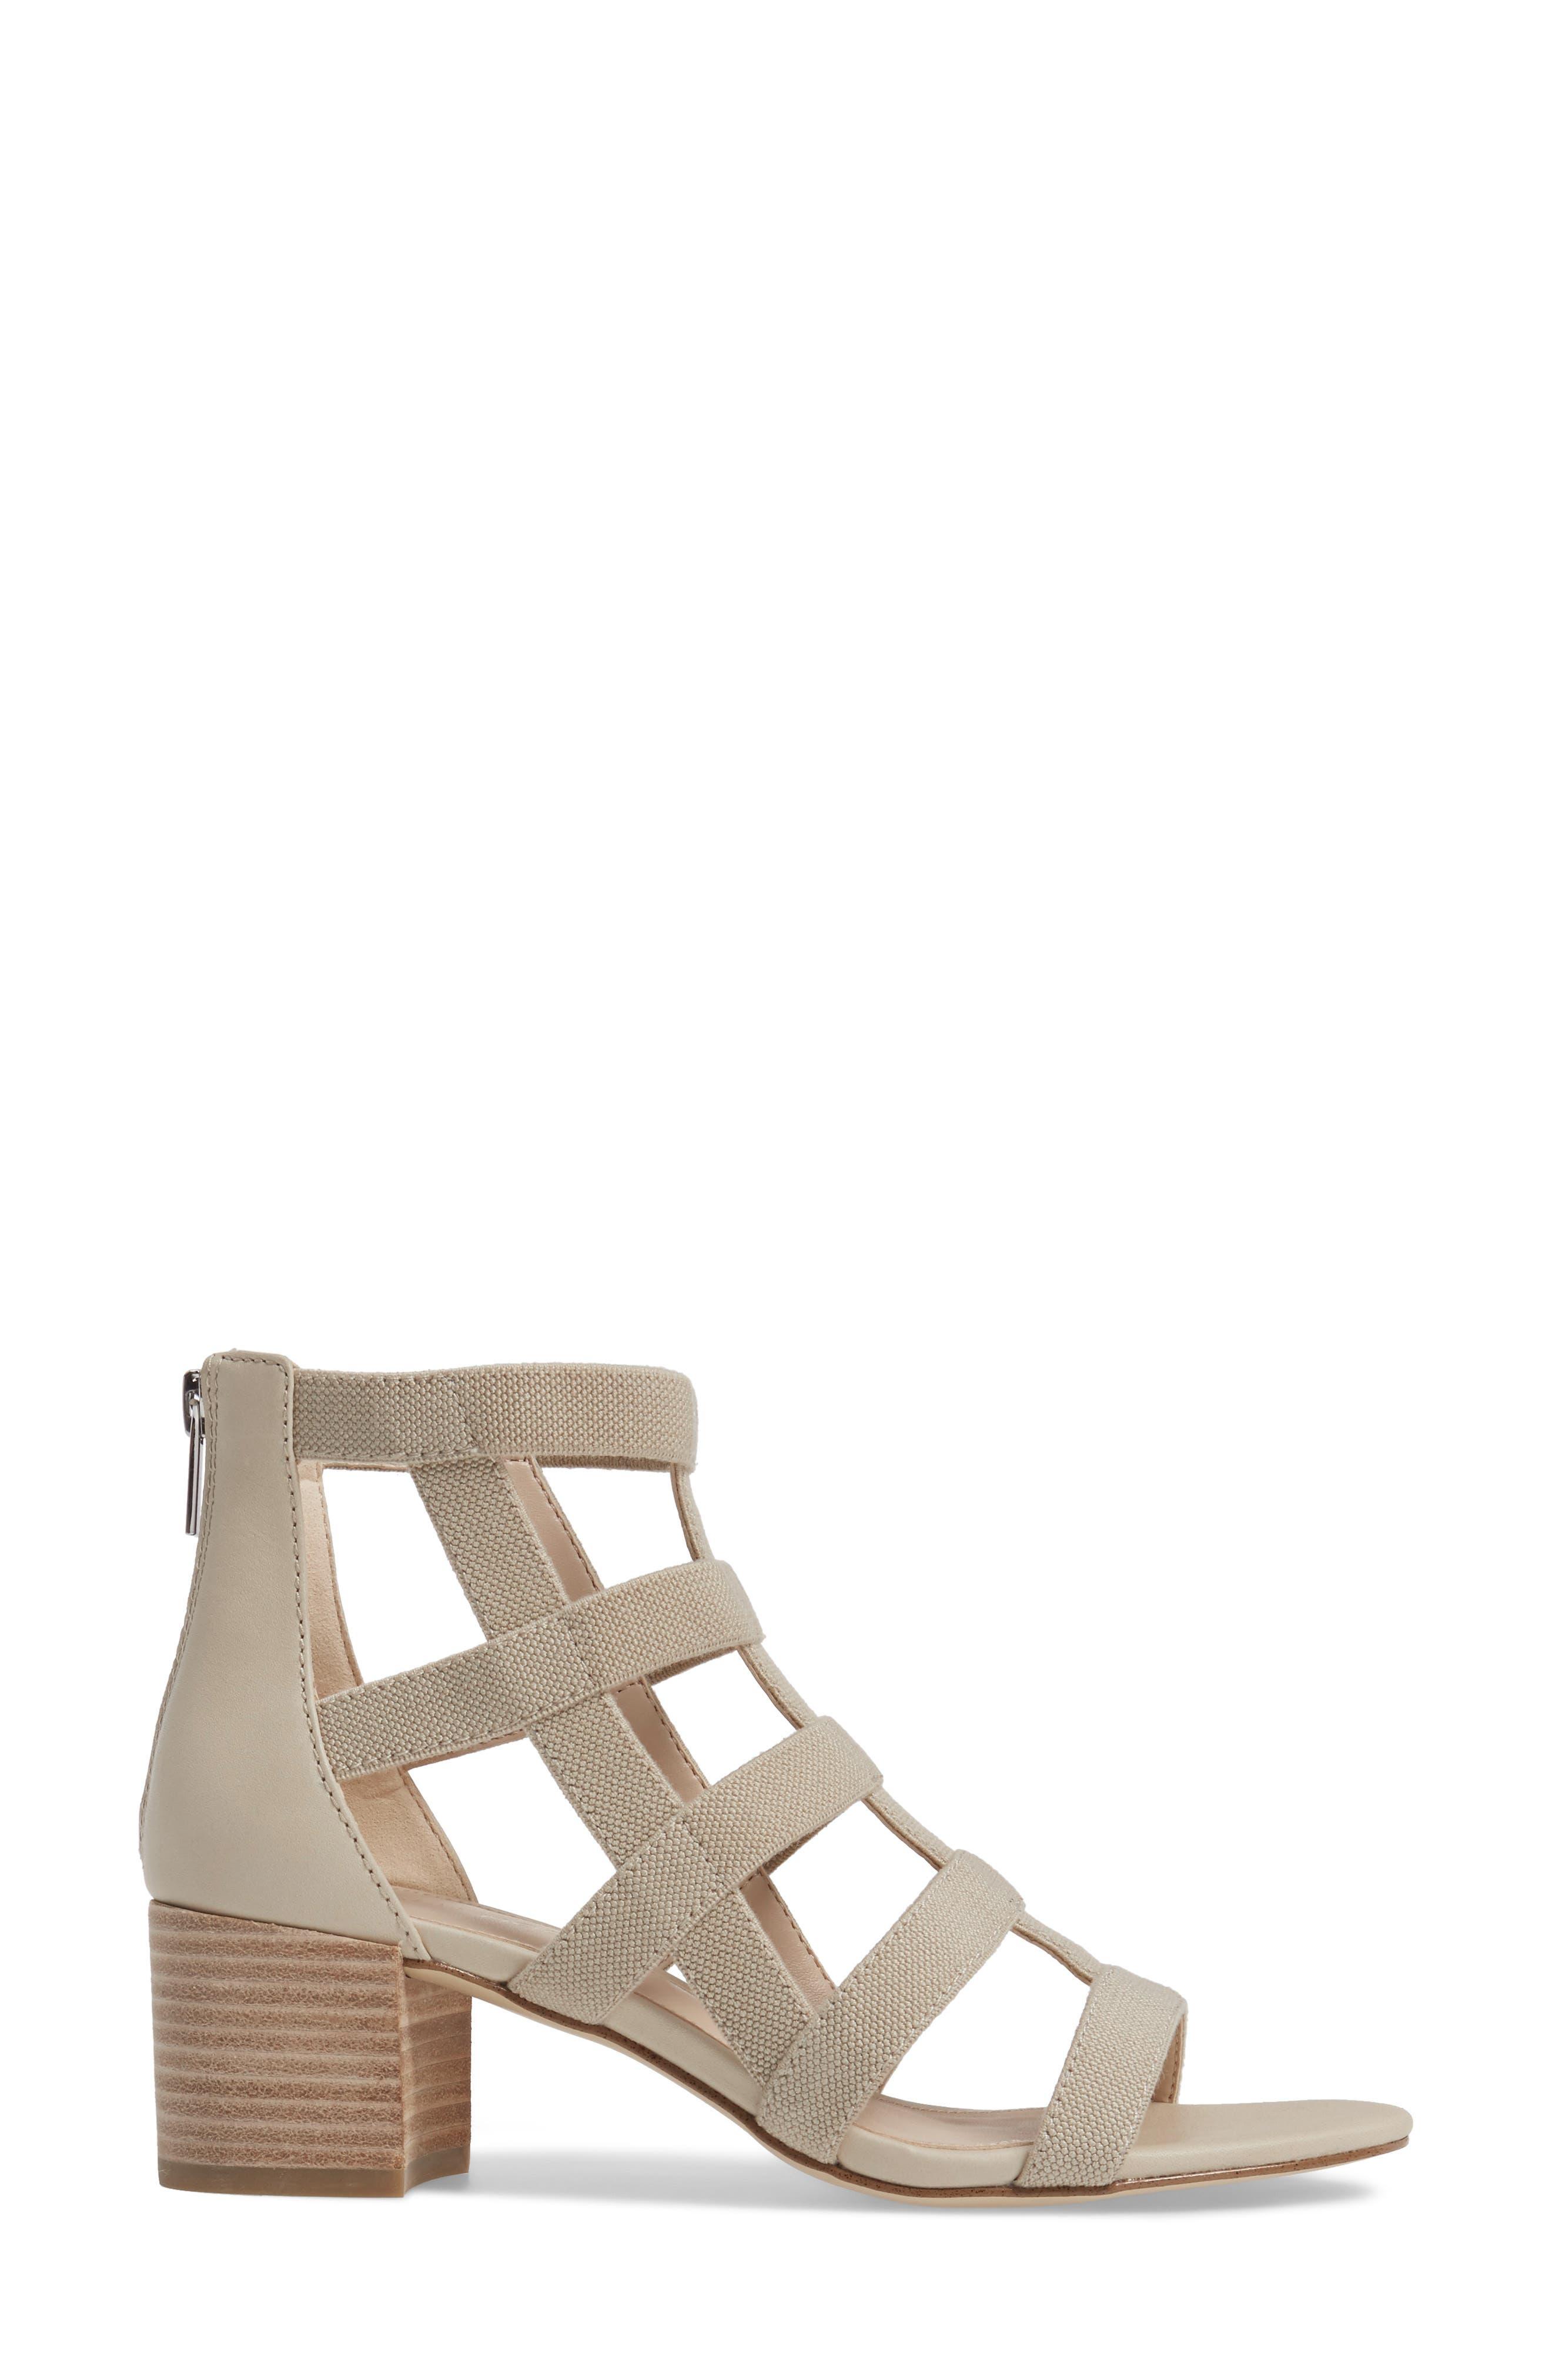 Alternate Image 3  - Pelle Moda Unkar Block Heel Sandal (Women)